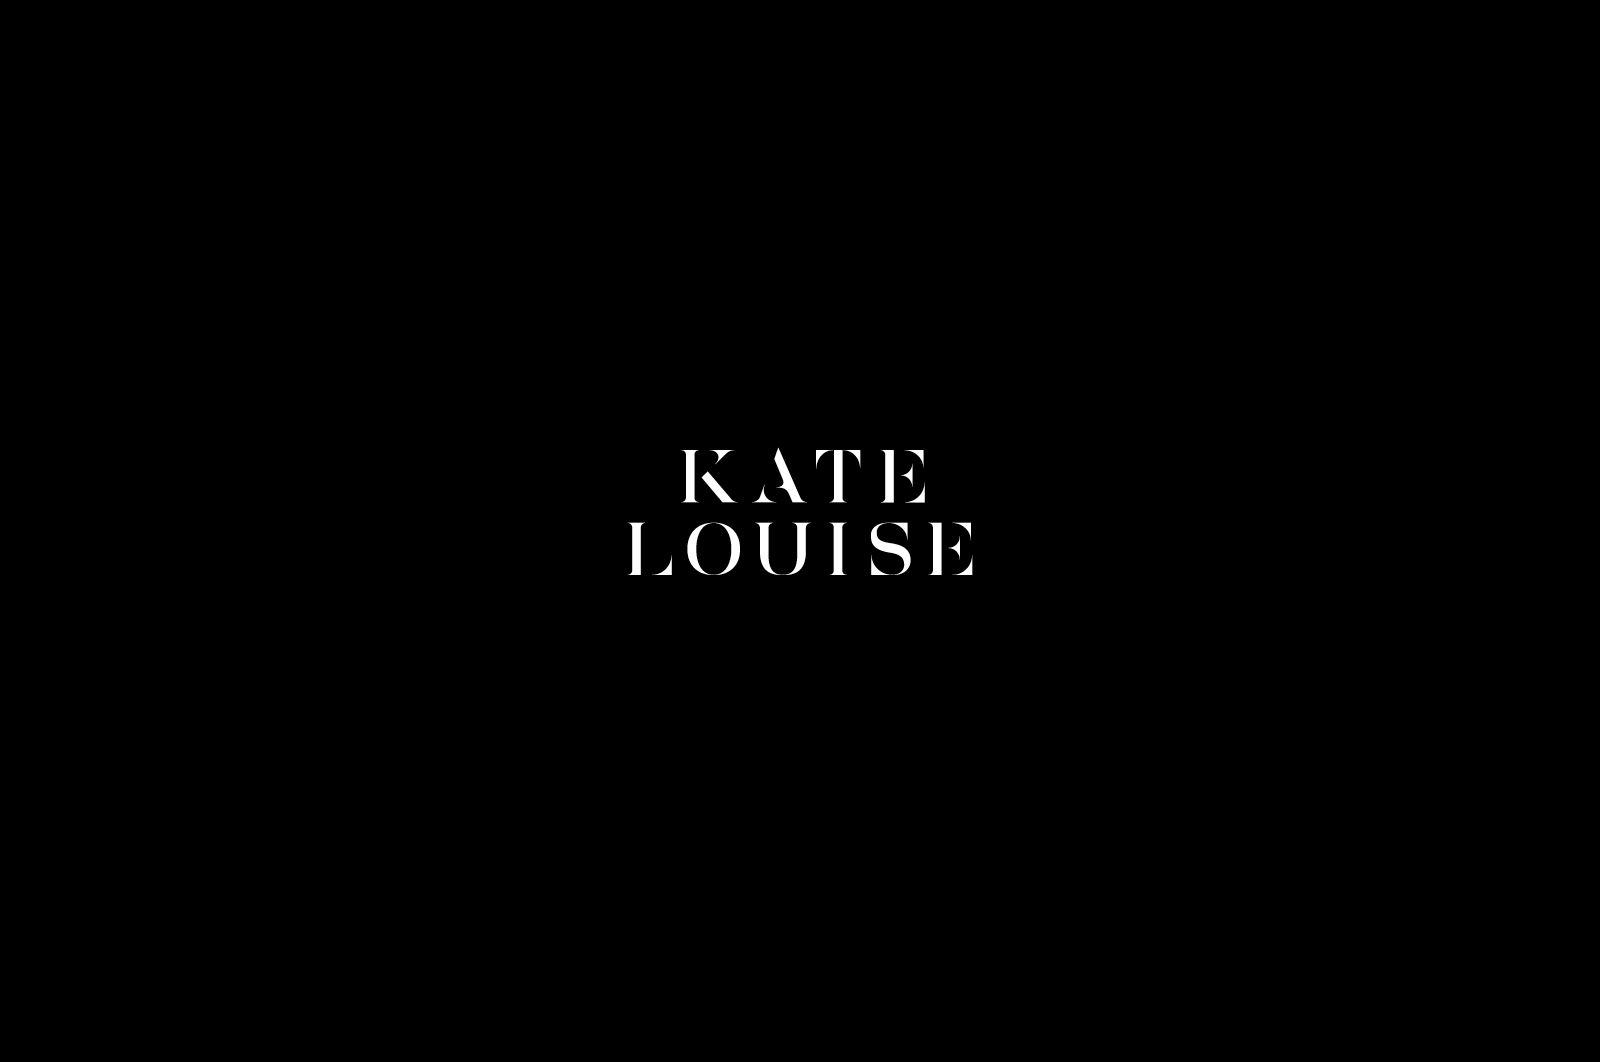 KATE_LOUISE_BRANDING_©DYLAN_MCDONOUGH_1